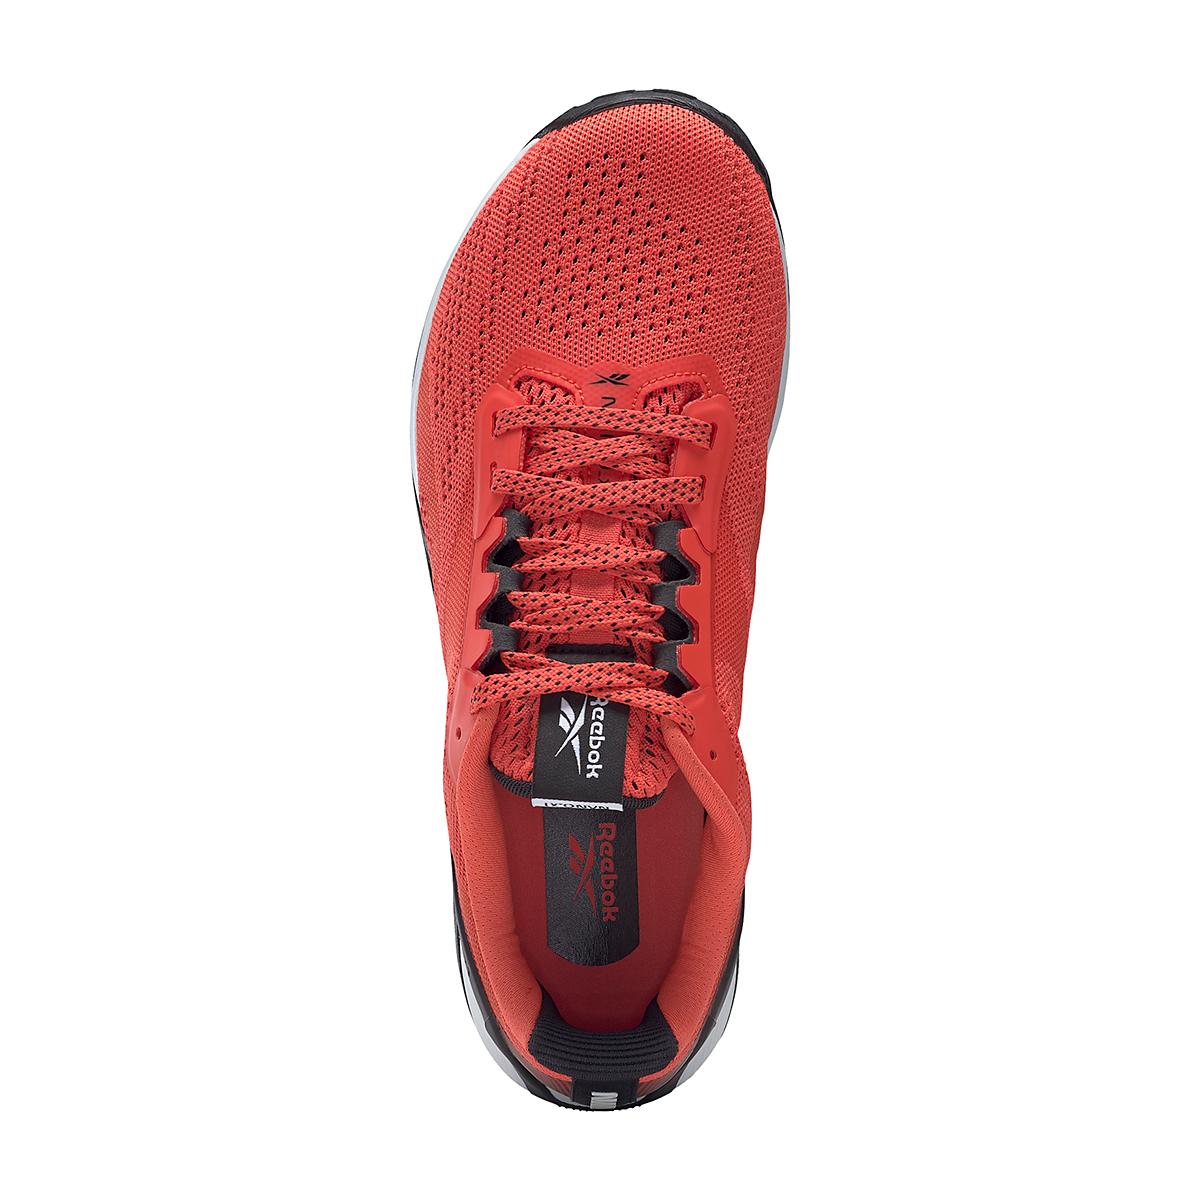 Men's Reebok Nano X1 Training Shoe - Color: Dynamic Red/White/Black - Size: 7 - Width: Regular, Dynamic Red/White/Black, large, image 3